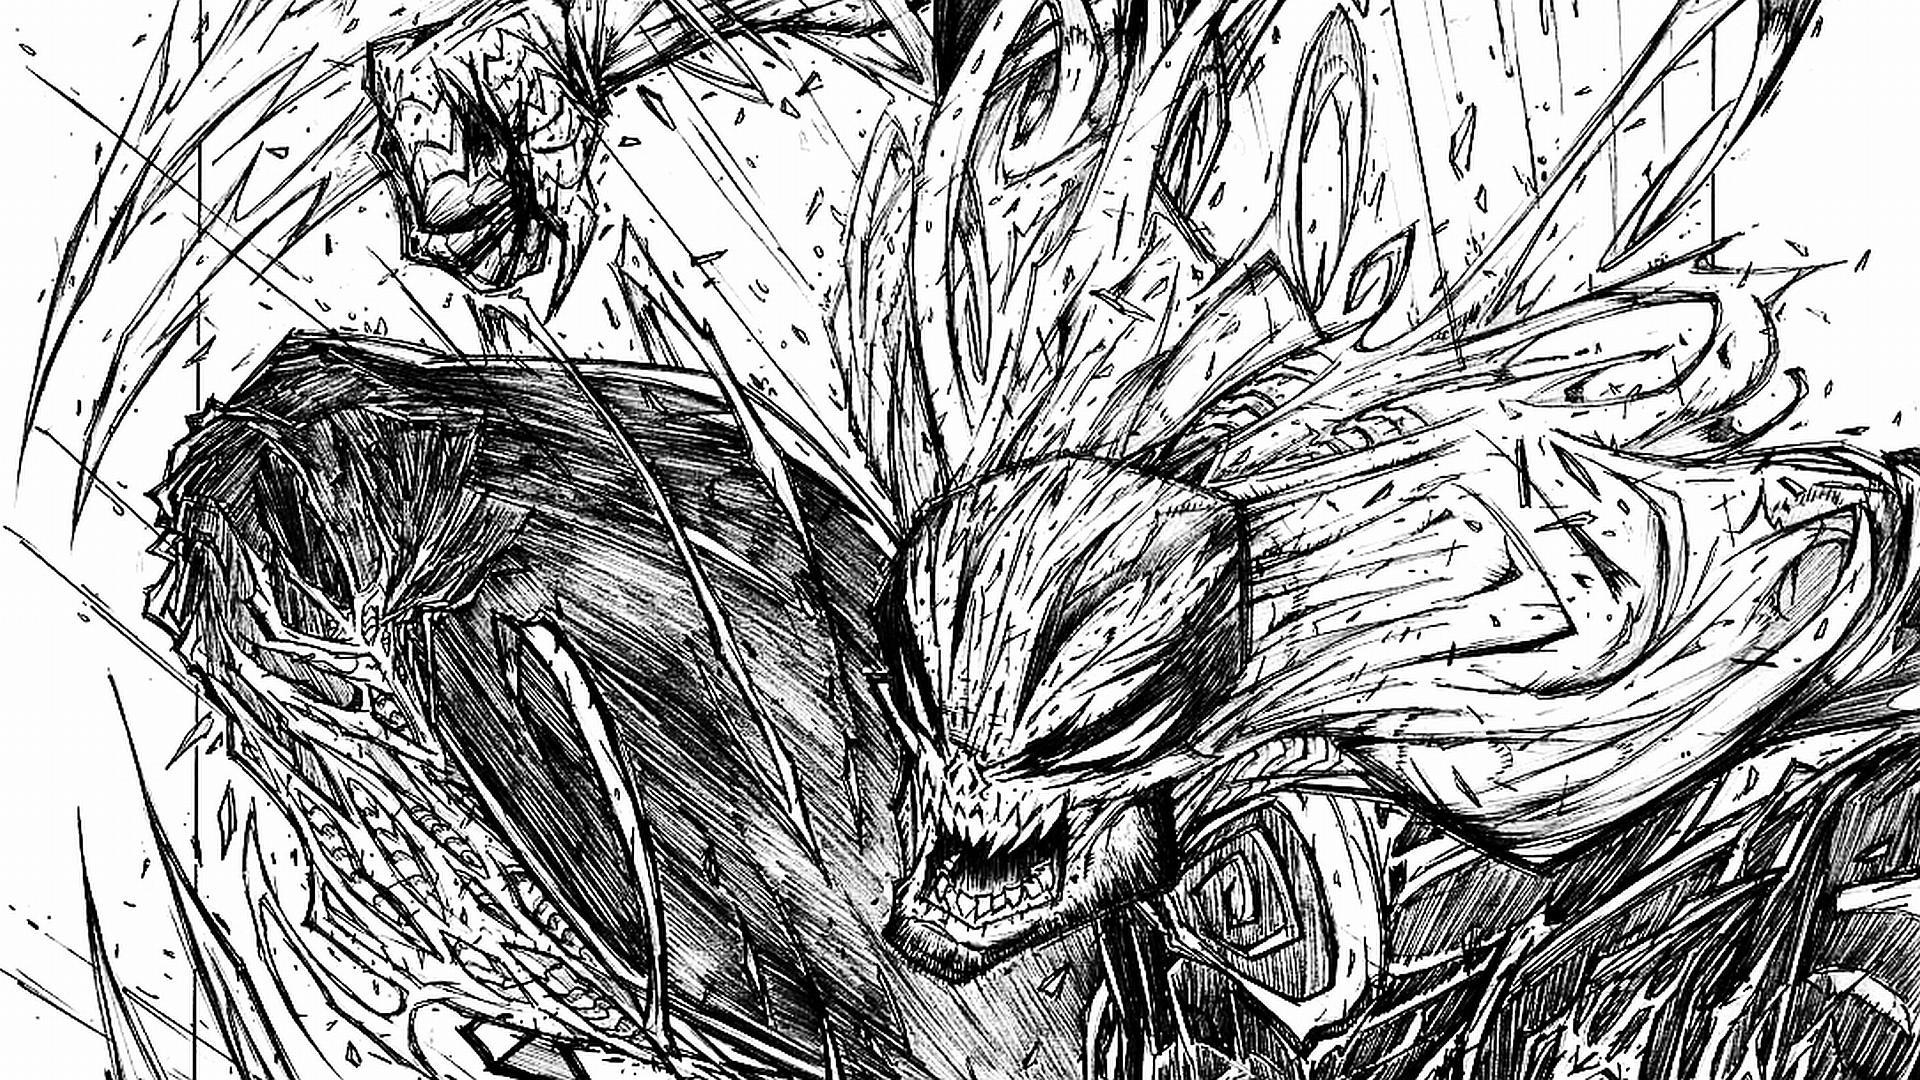 Spawn Comics wallpapers HD quality